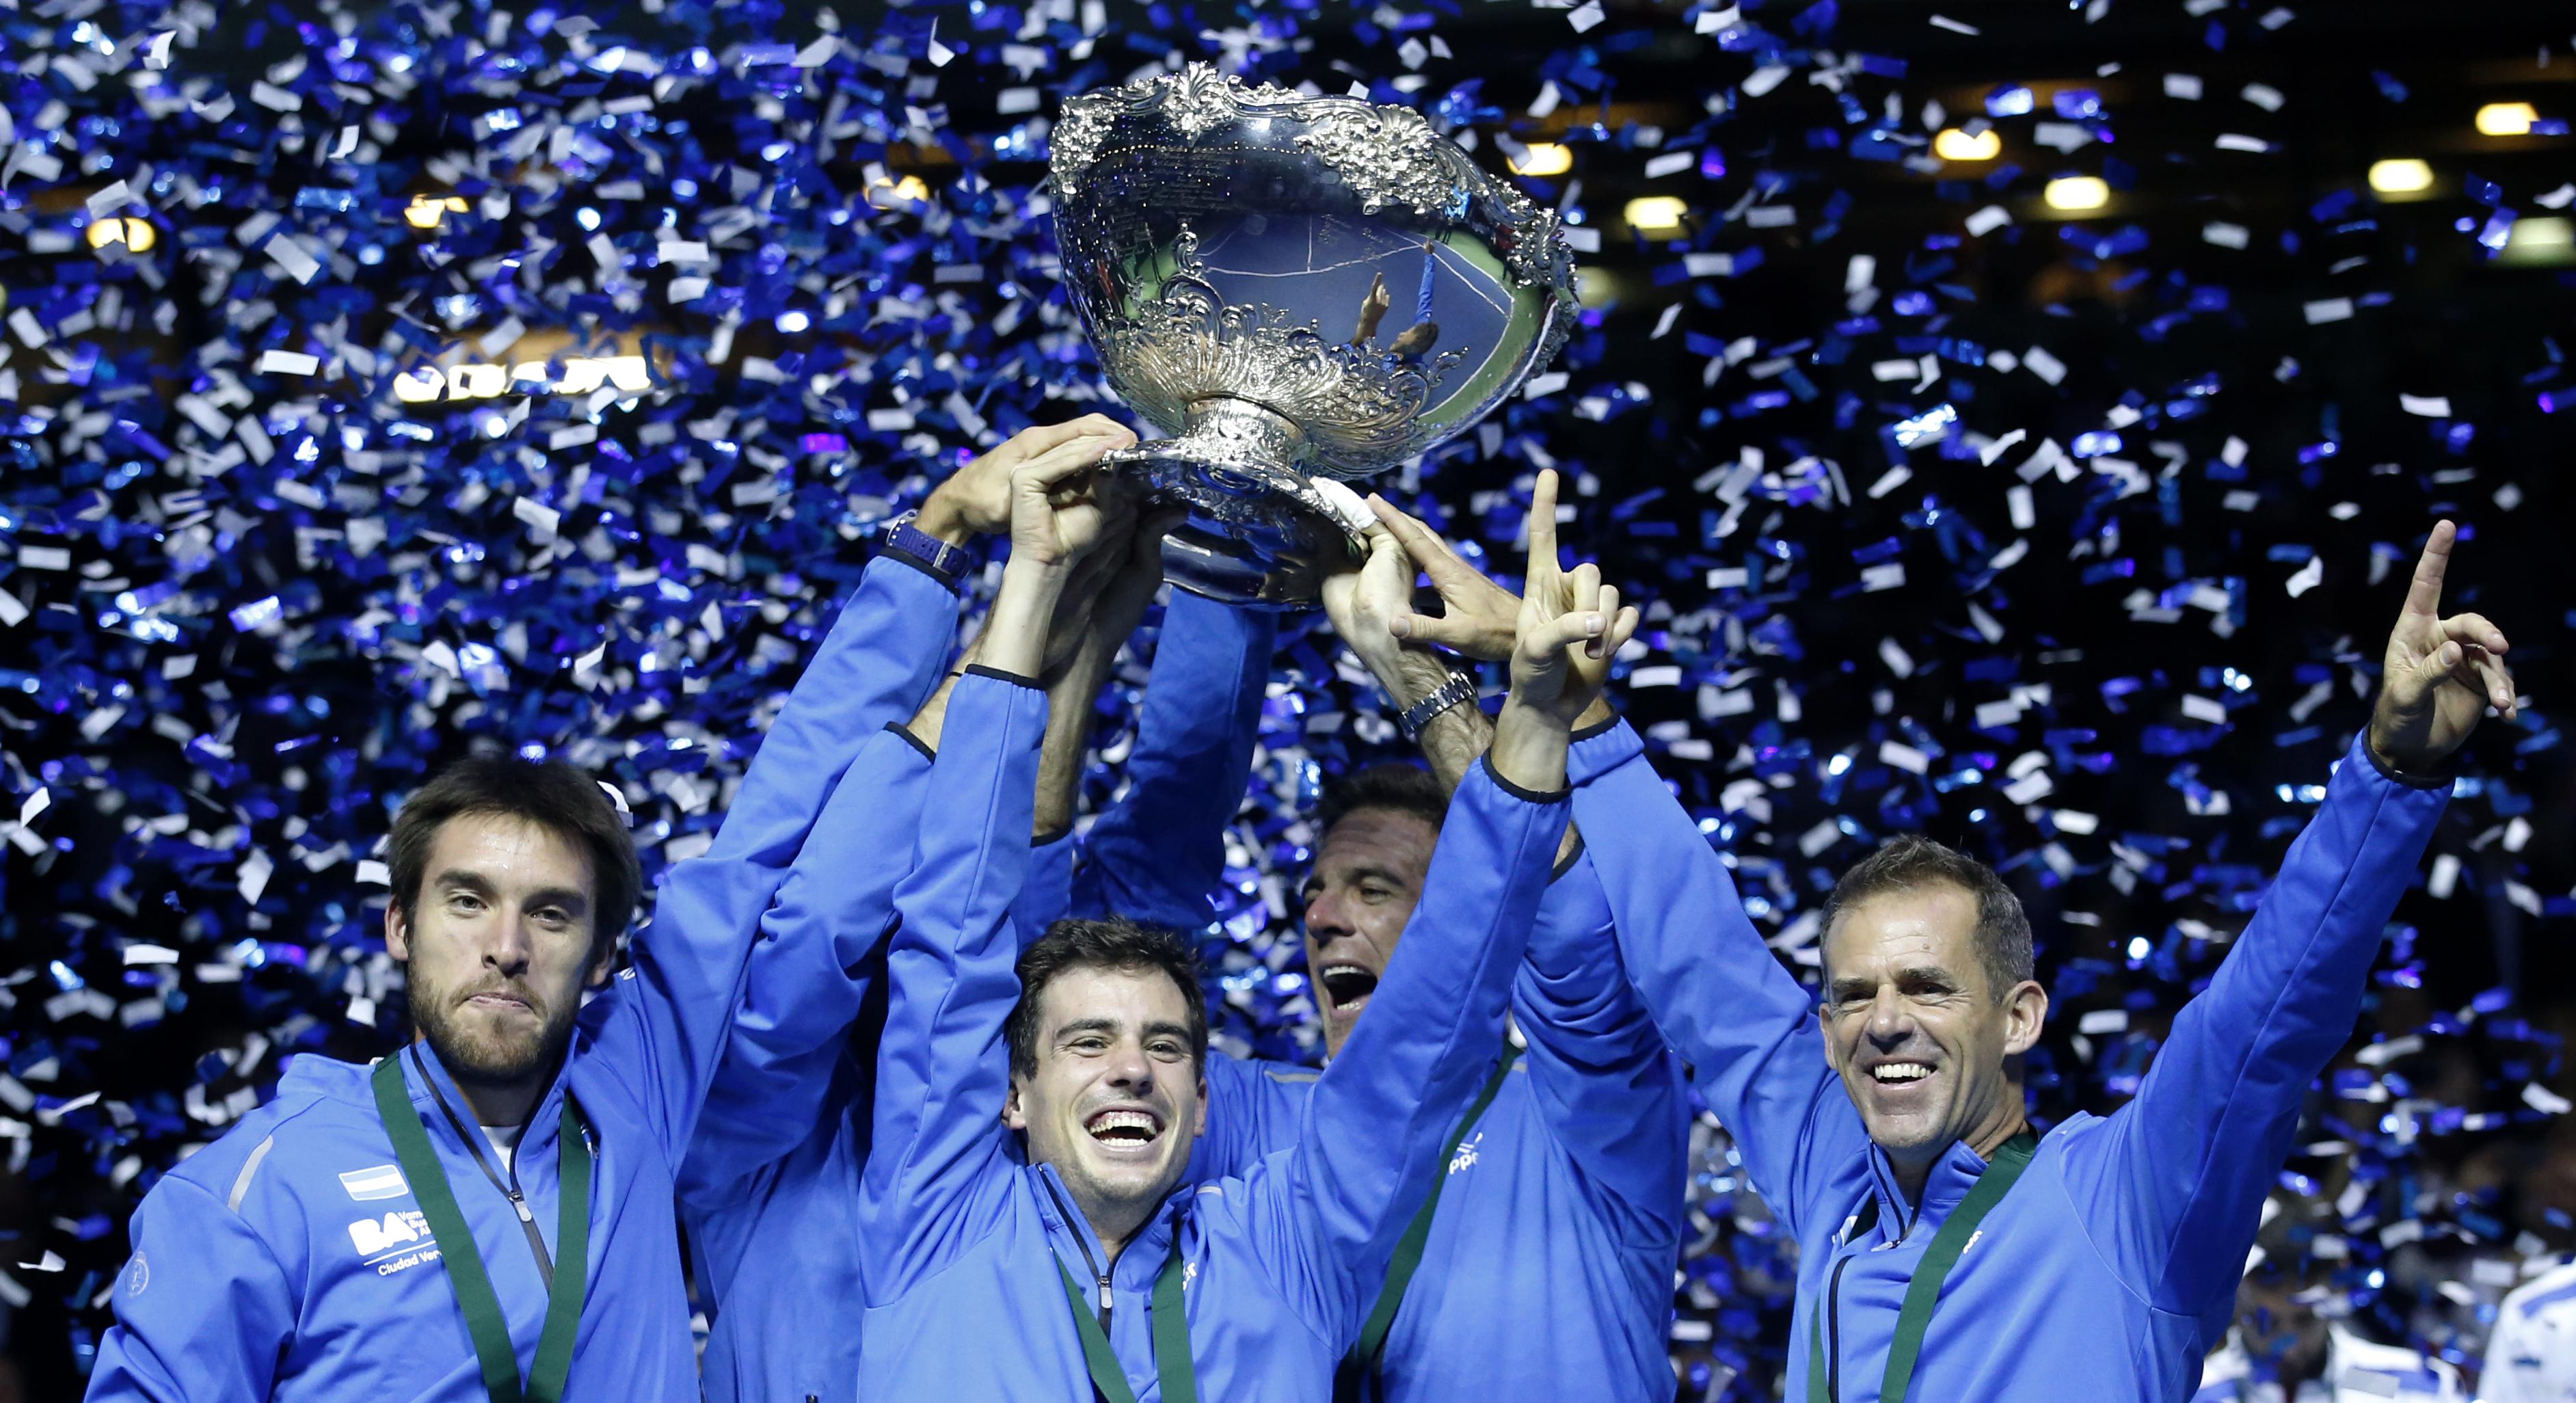 Argentina's team lifts the trophy after winning the Davis Cup final in Zagreb, Croatia, Sunday, Nov. 27, 2016. Argentina defeated Croatia 3-2 in the Davis (AP Photo/Darko Vojinovic)